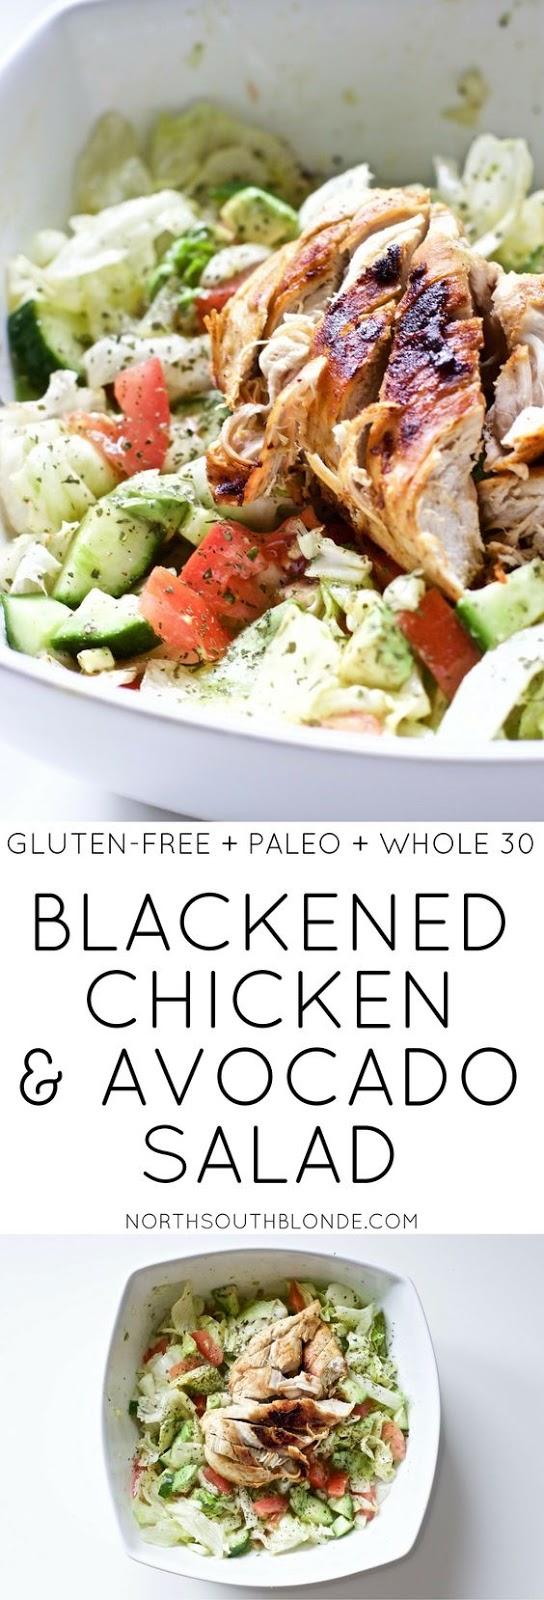 Blackened Chicken and avocado Salad (Gluten-Free, Paleo, Whole 30) #blackenedchicken #avocadosalad #salad #avocado #lunchideas #easyrecipes